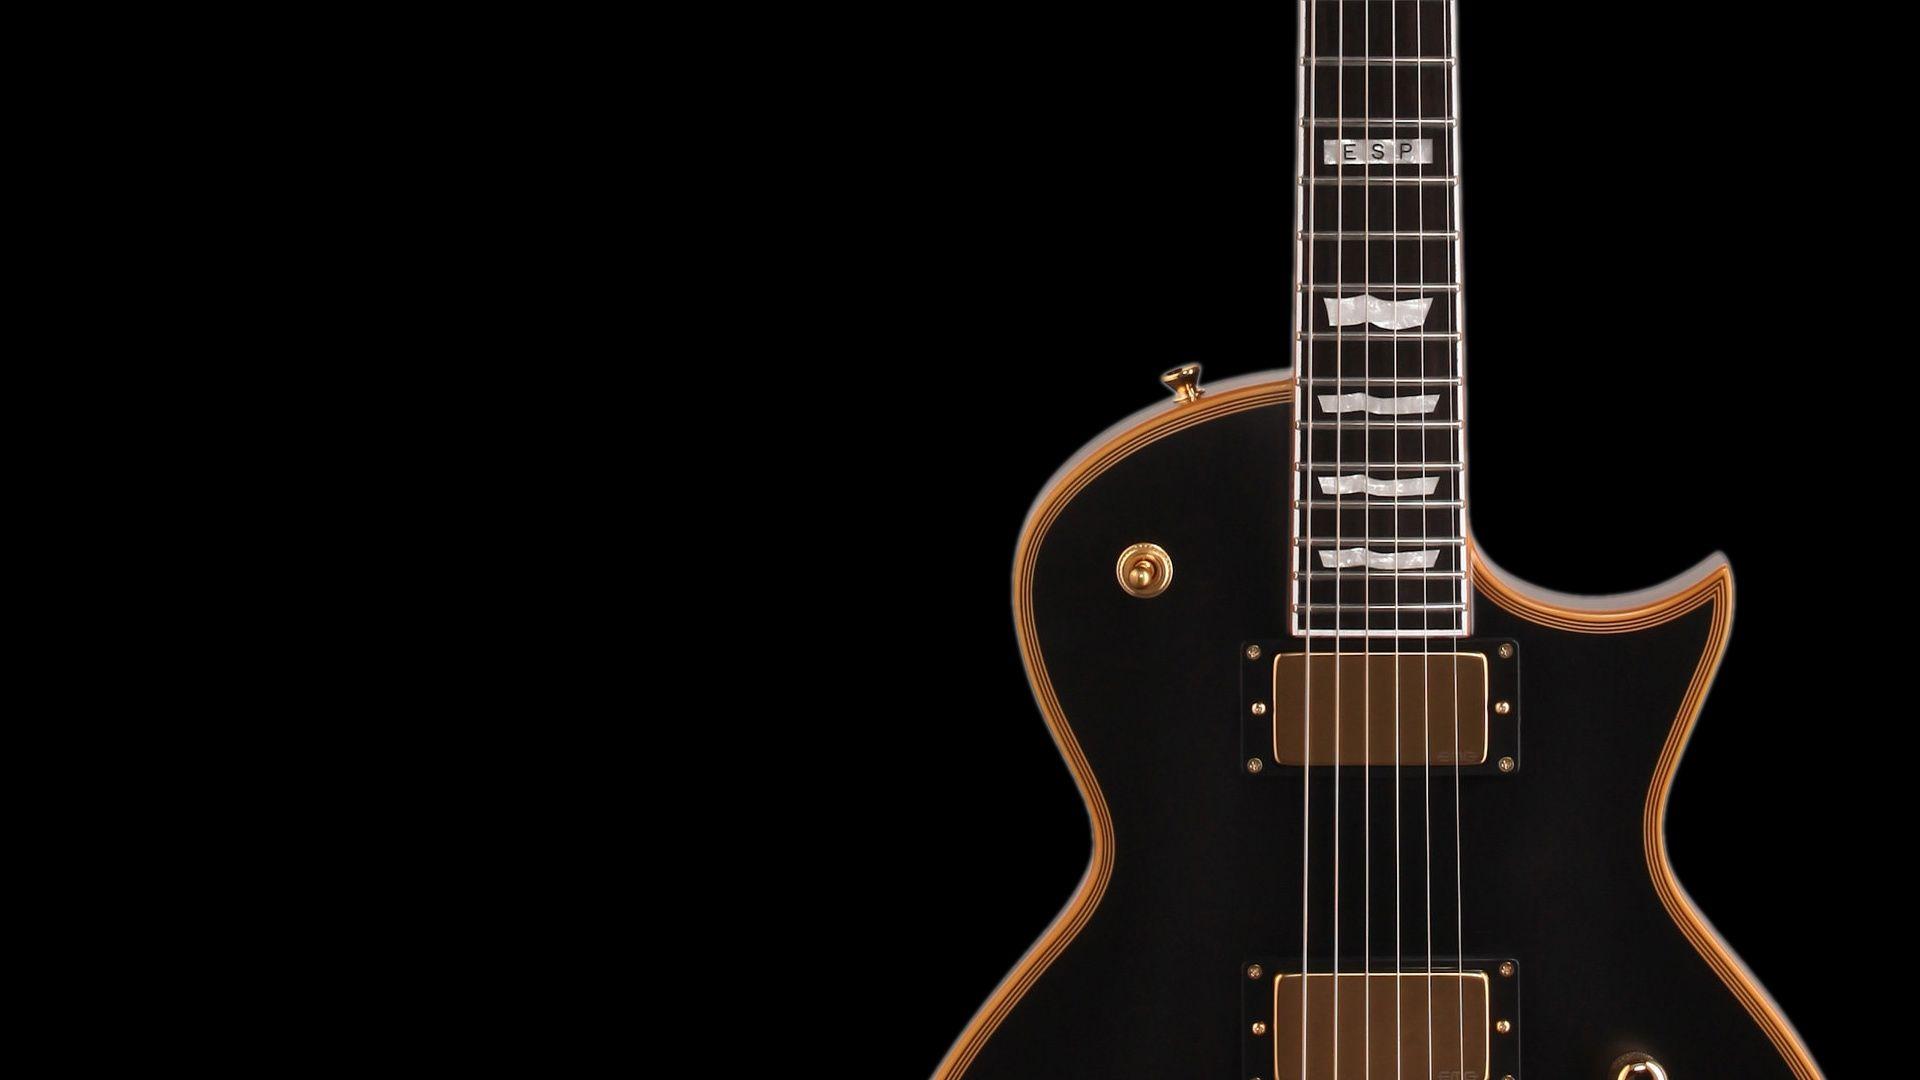 Electric Guitar, PC Wallpaper